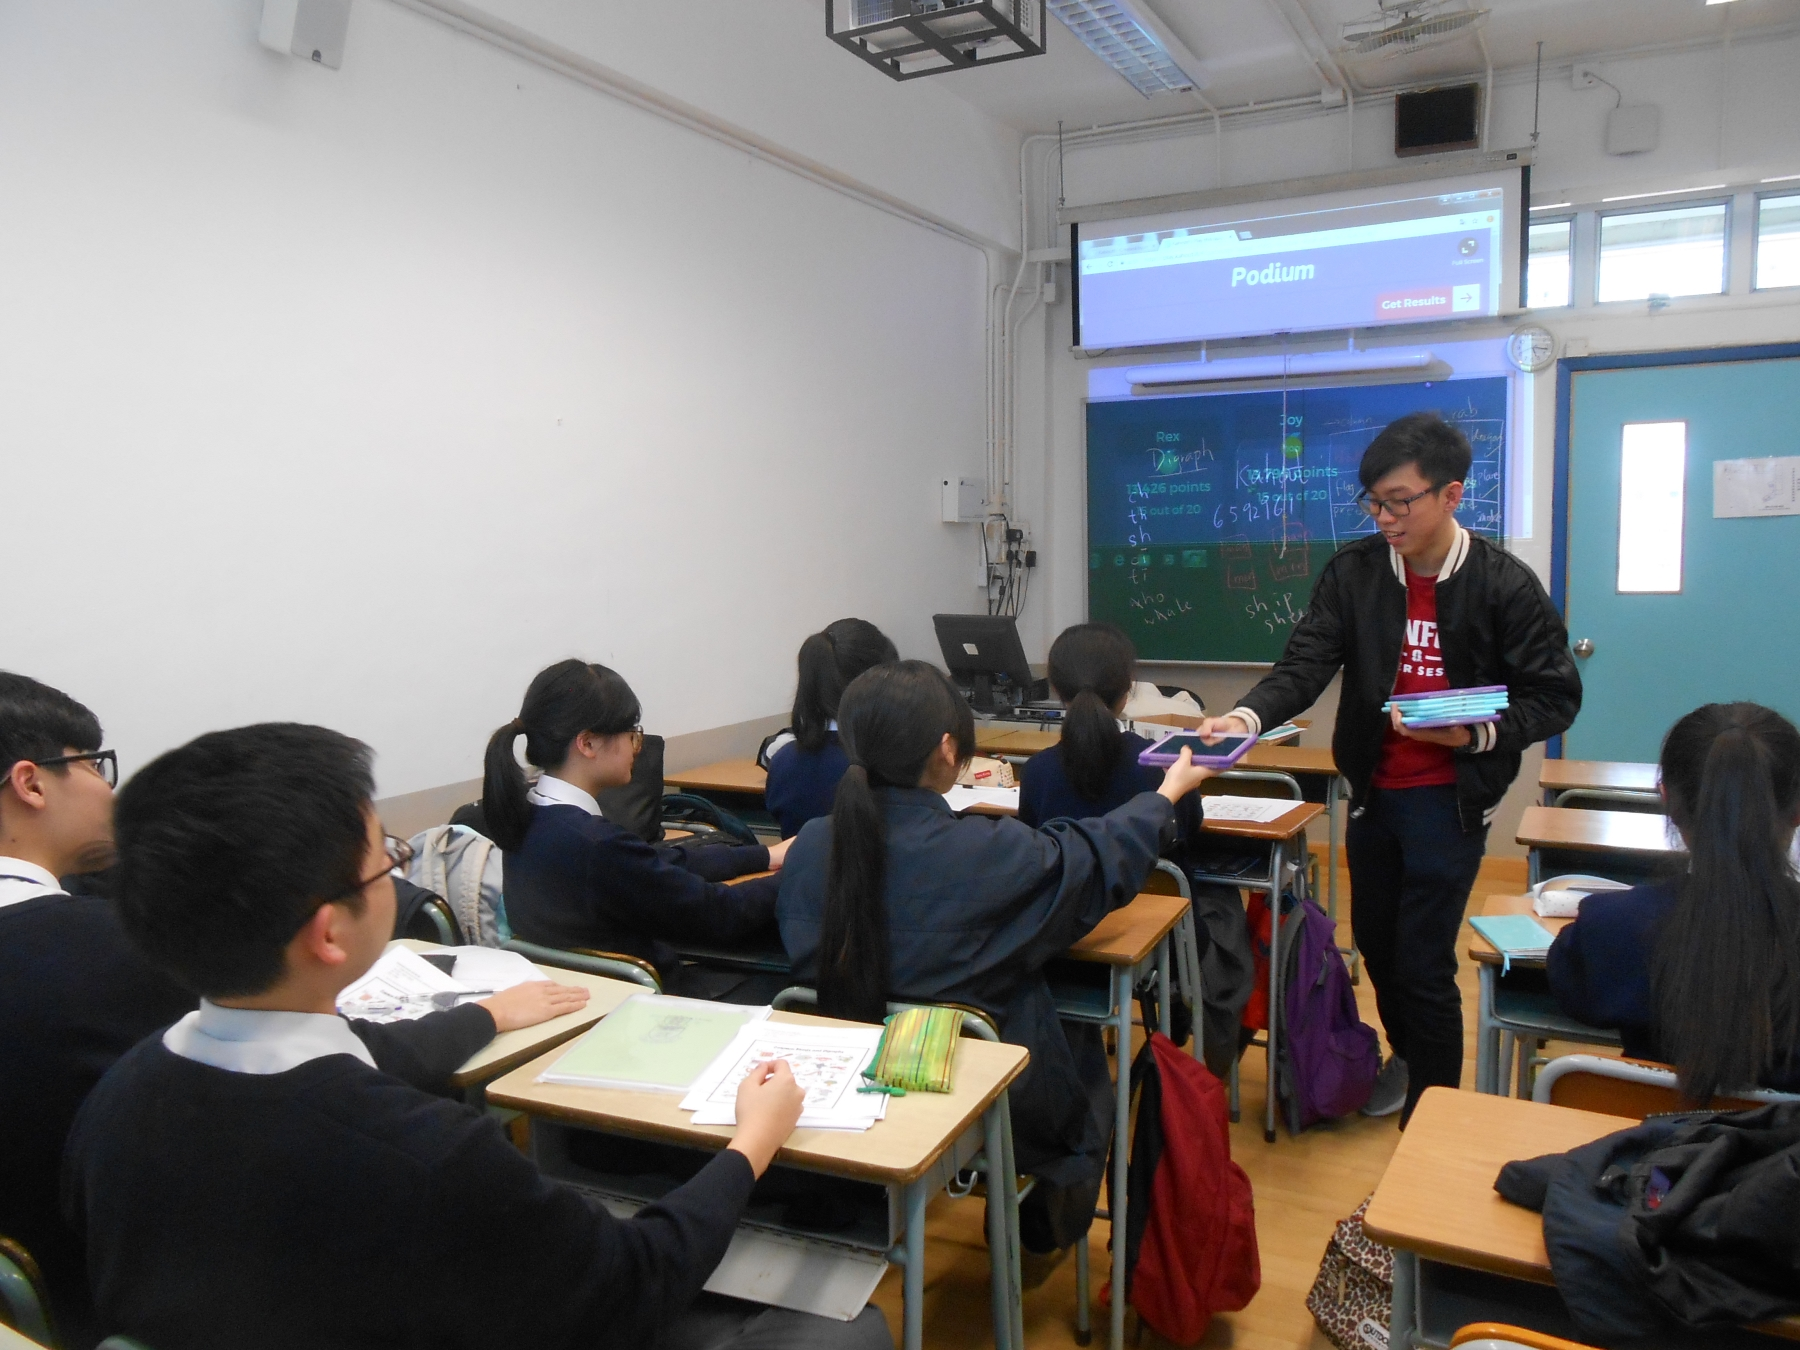 http://npc.edu.hk/sites/default/files/dscn9609.jpg